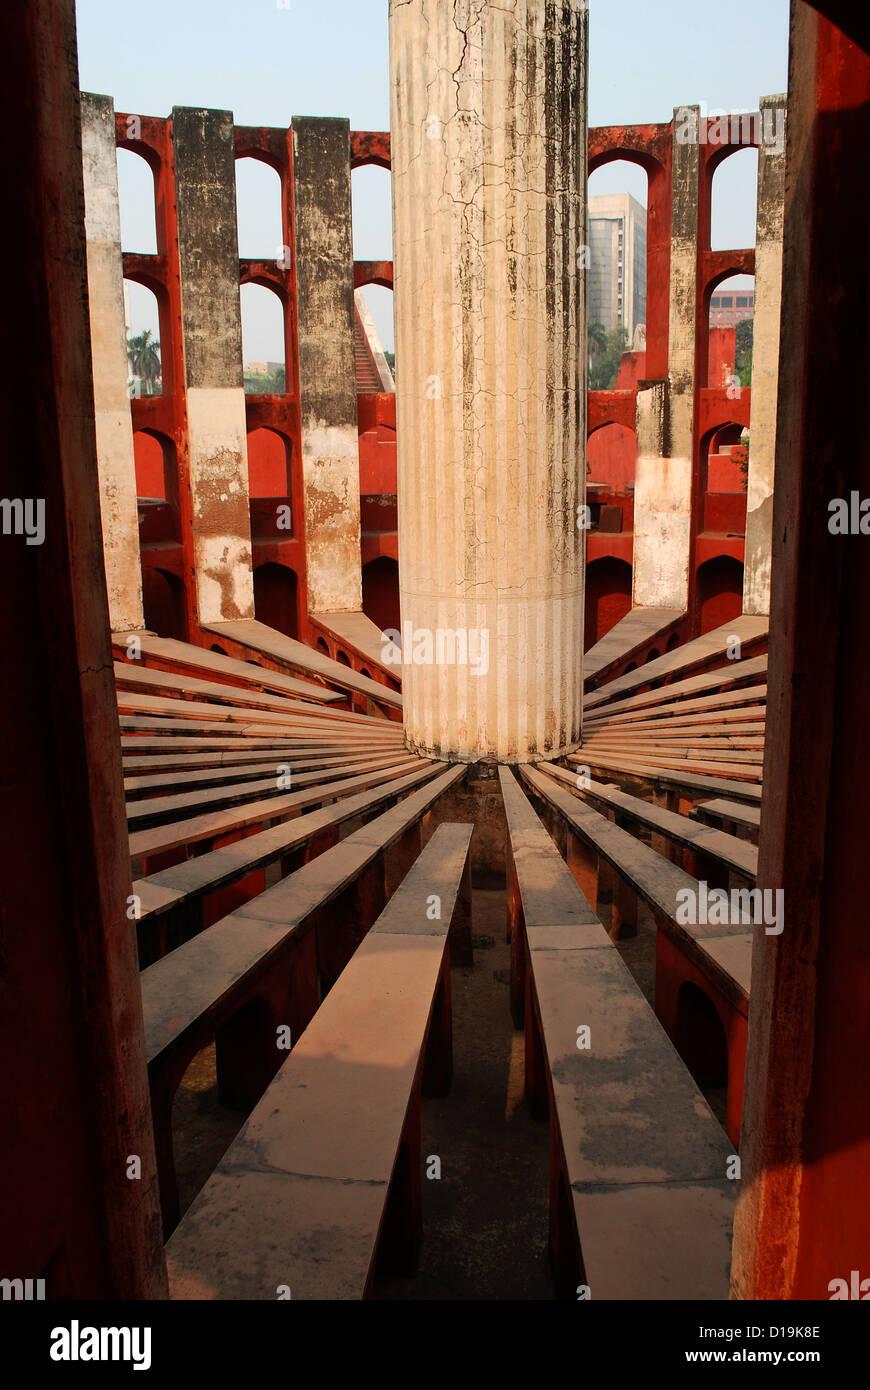 Jantar Mantar, un ancien observatoire astronomique de Delhi, Inde Photo Stock